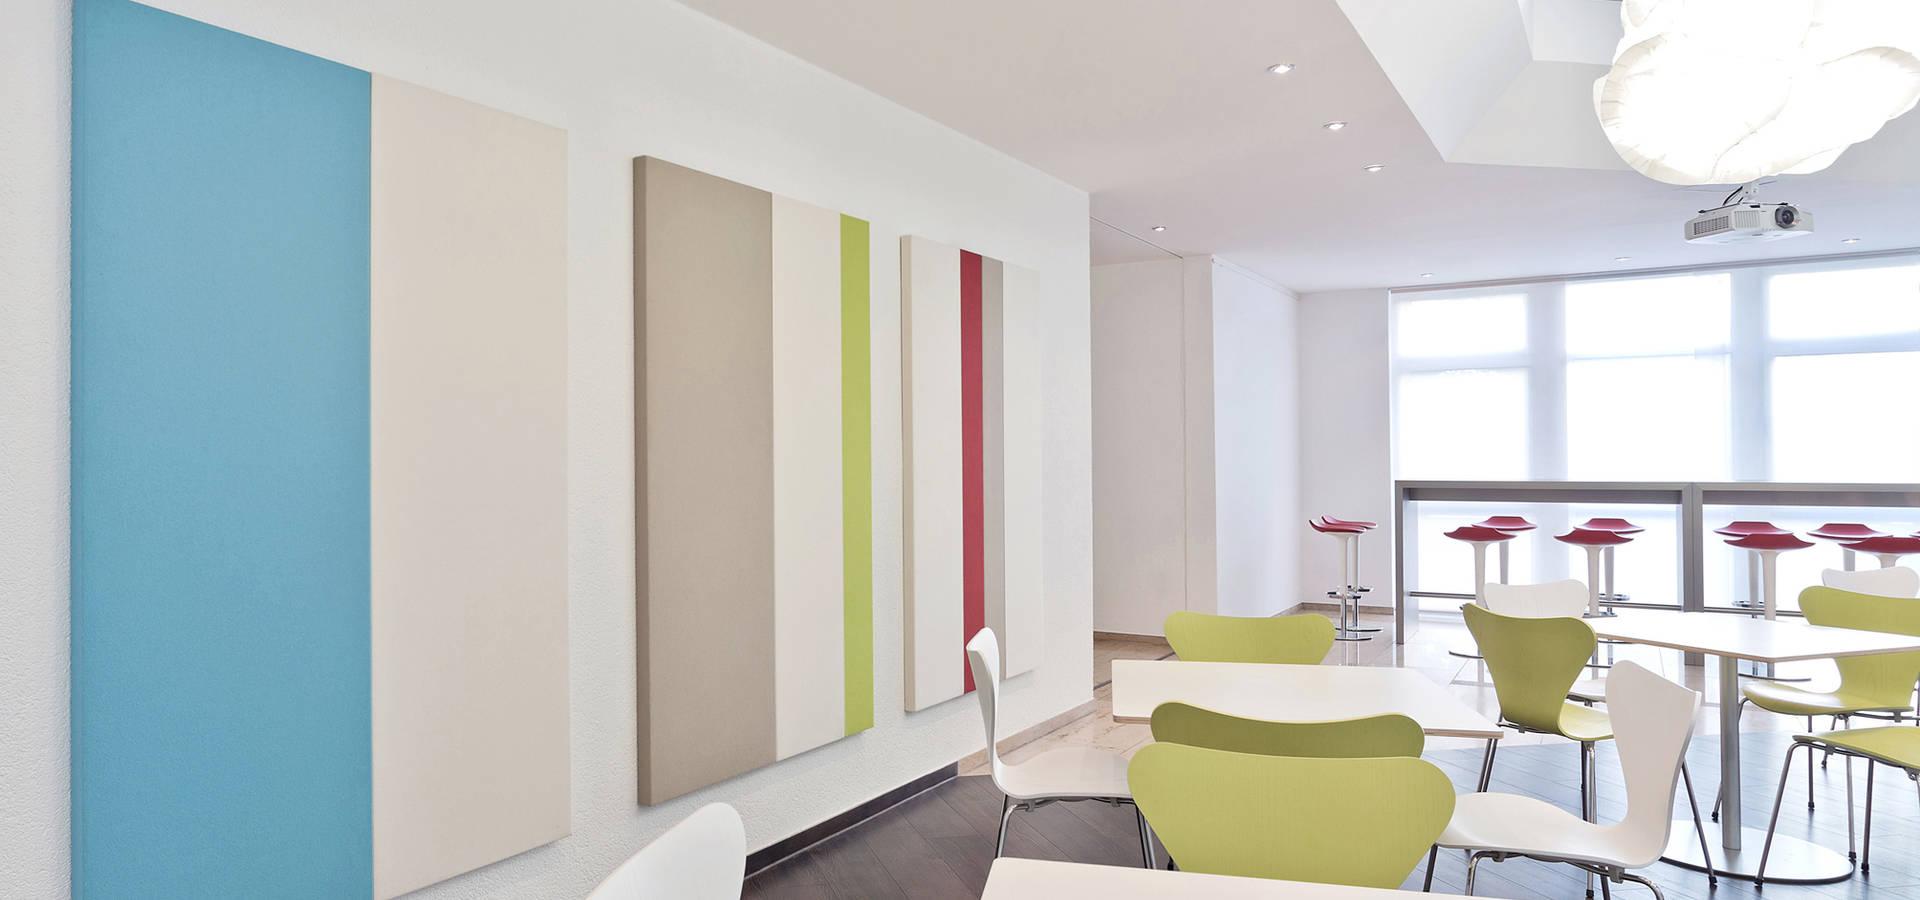 acousticpearls m bel accessoires in bremen homify. Black Bedroom Furniture Sets. Home Design Ideas